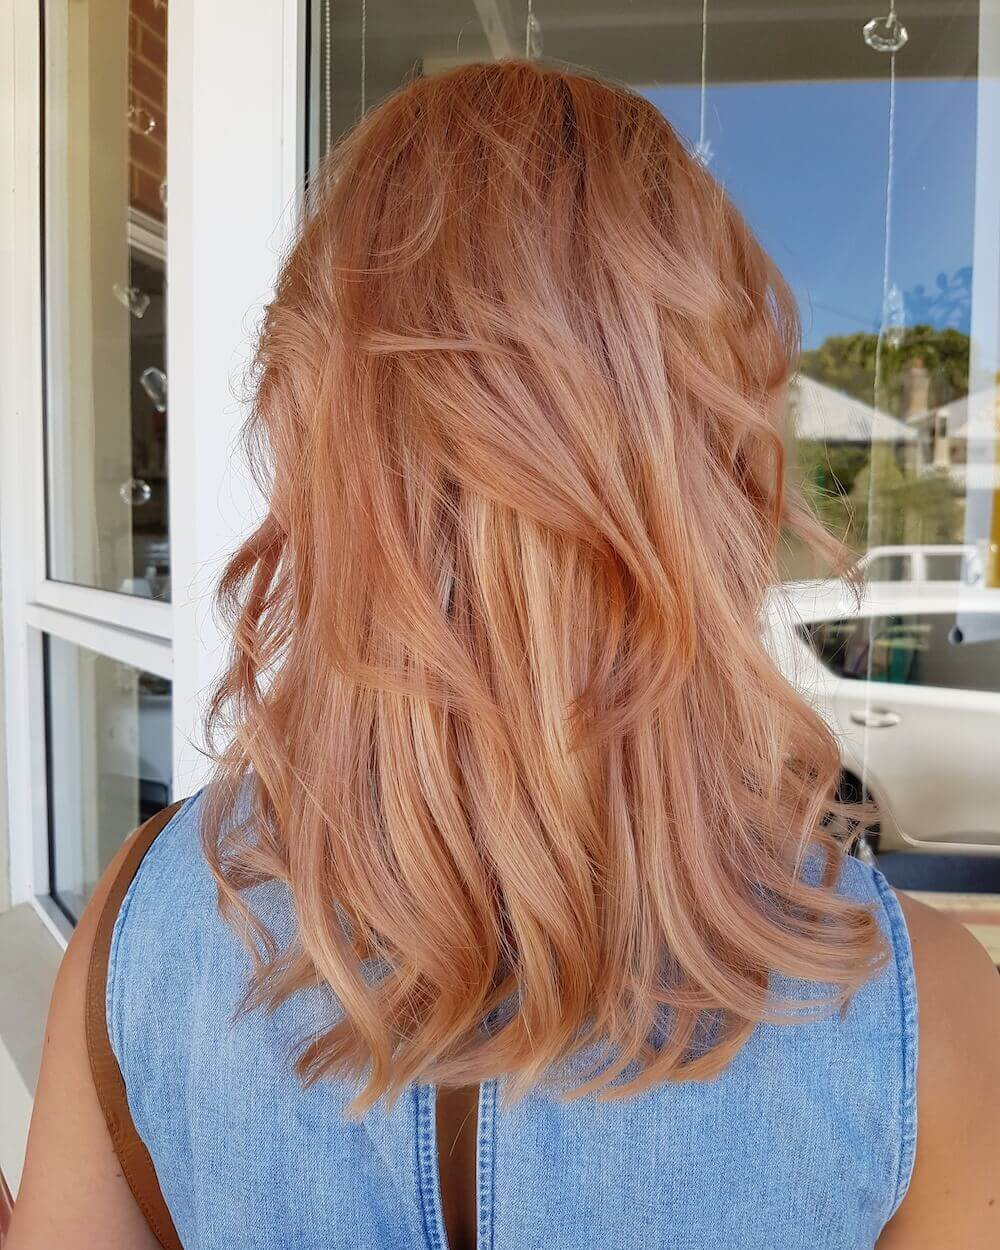 Rose gold hair - Kinks hairdressers Fremantle